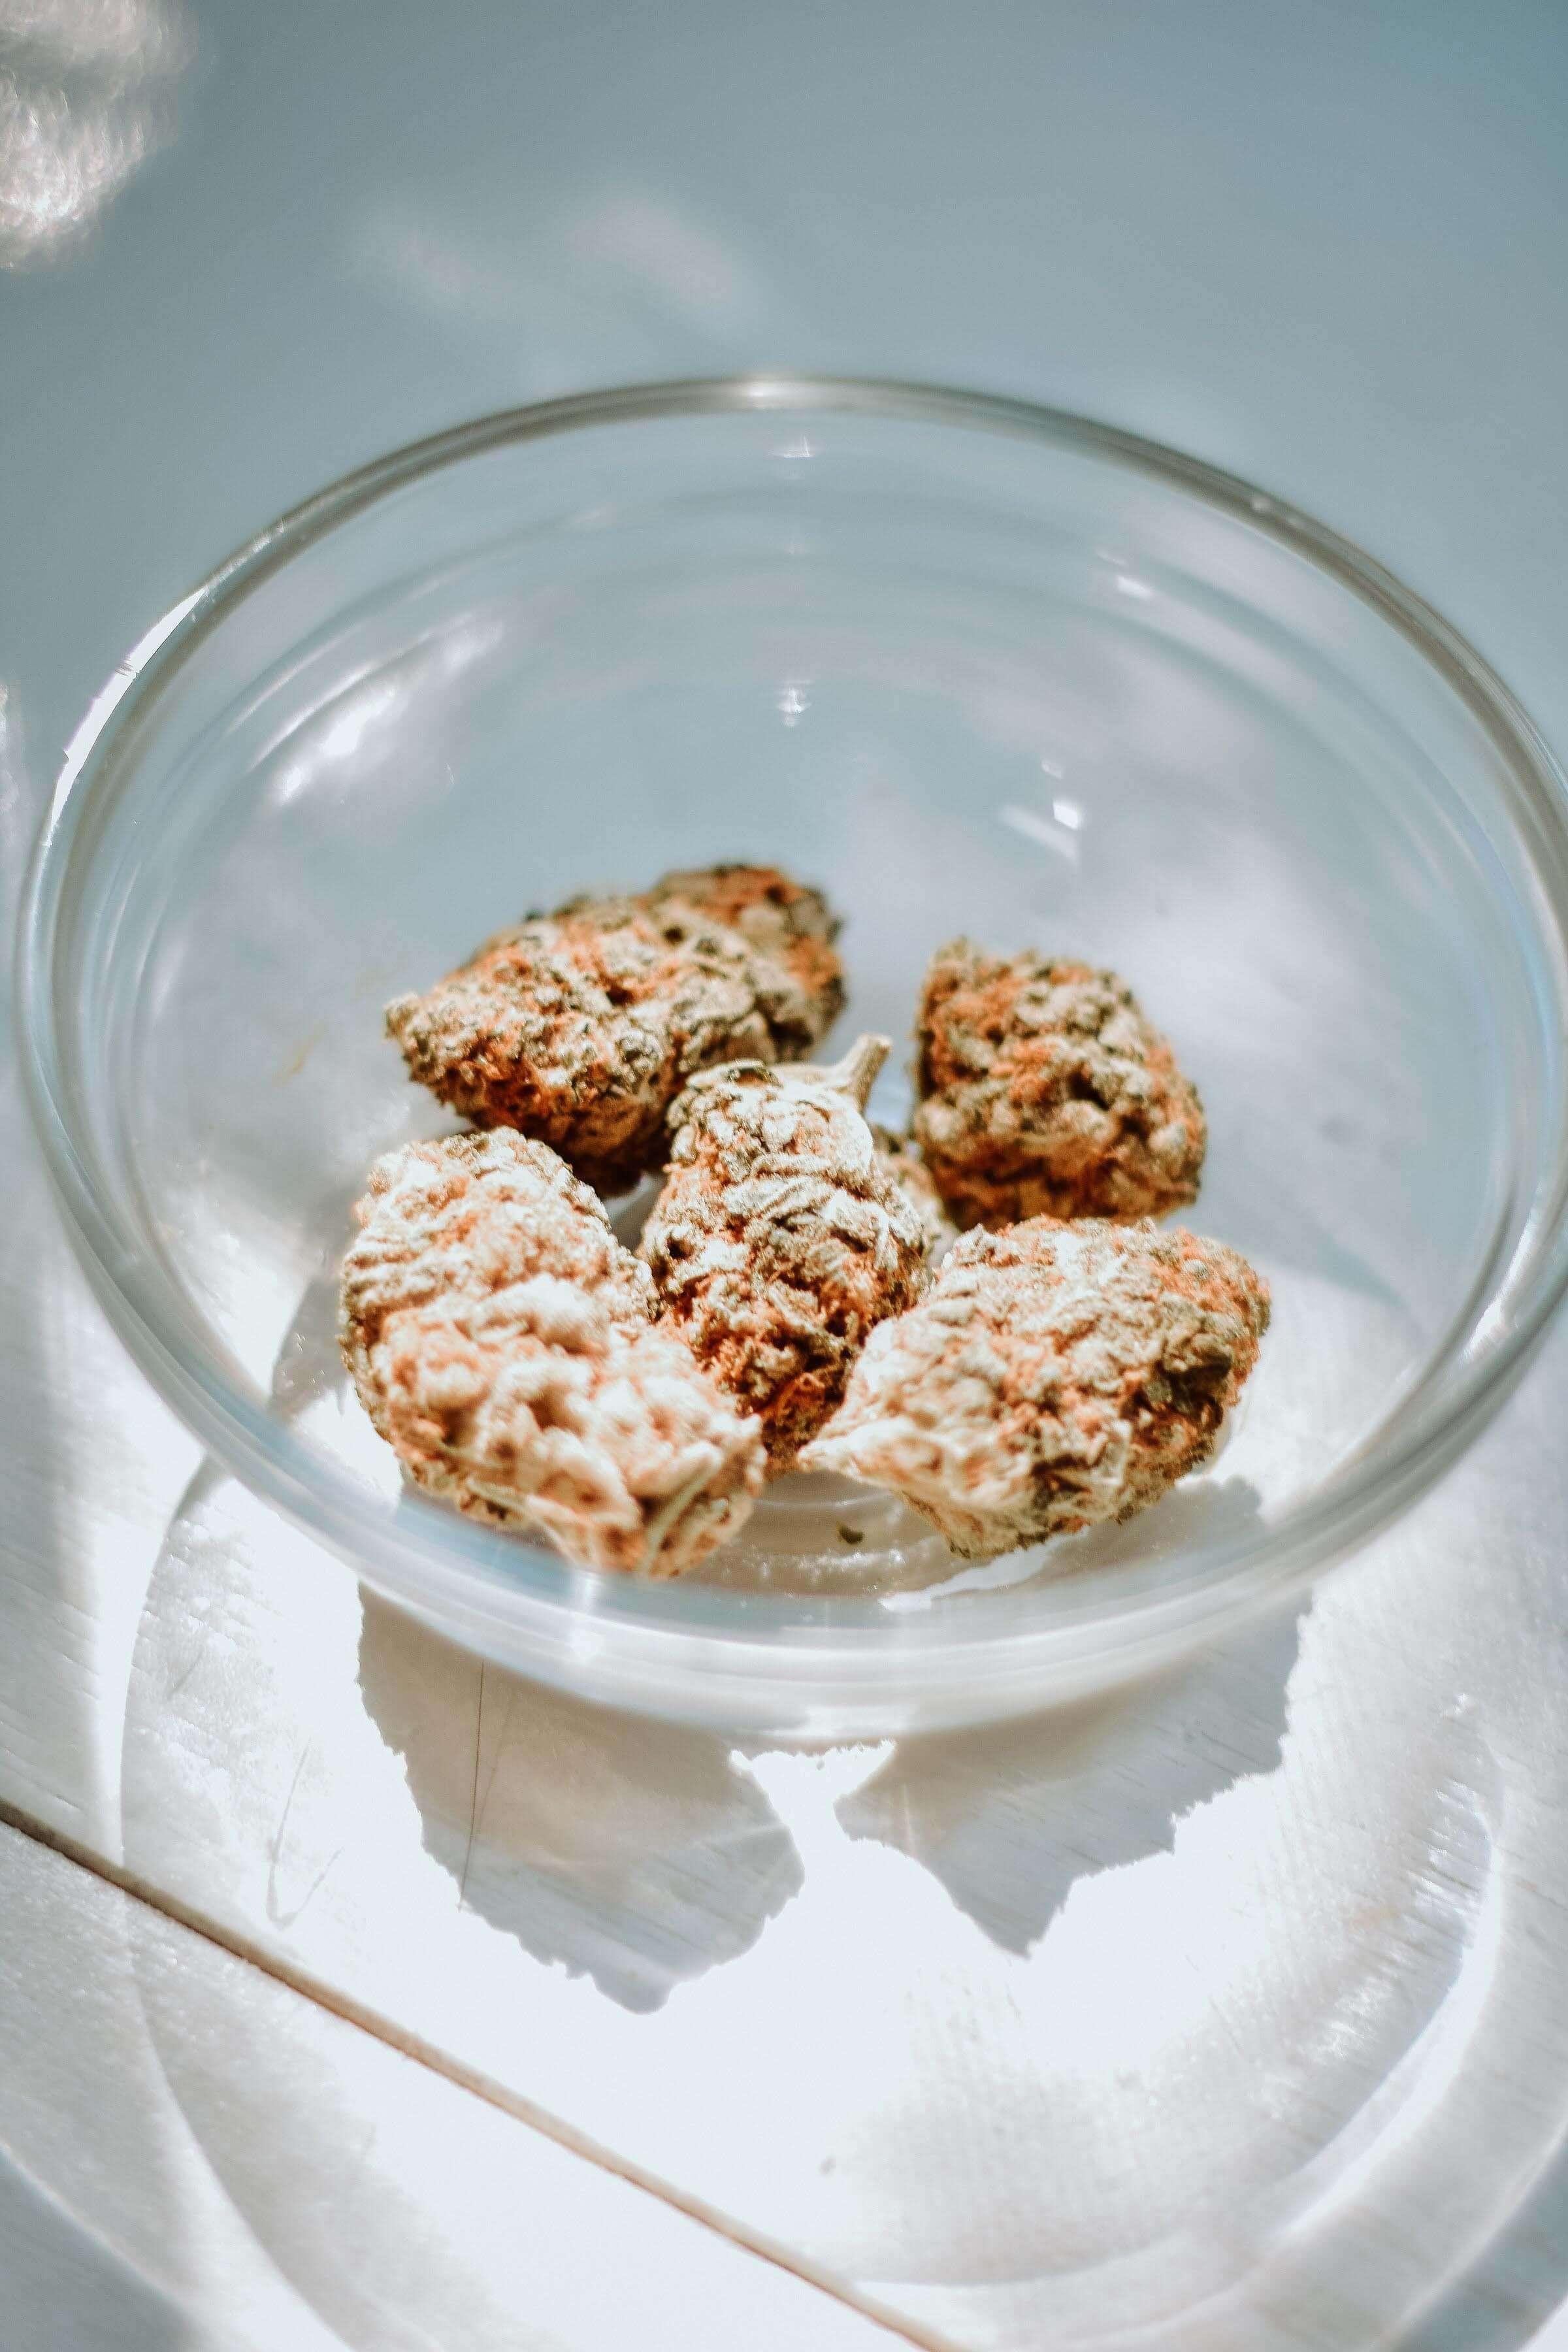 cannabis buds ina glass bowl